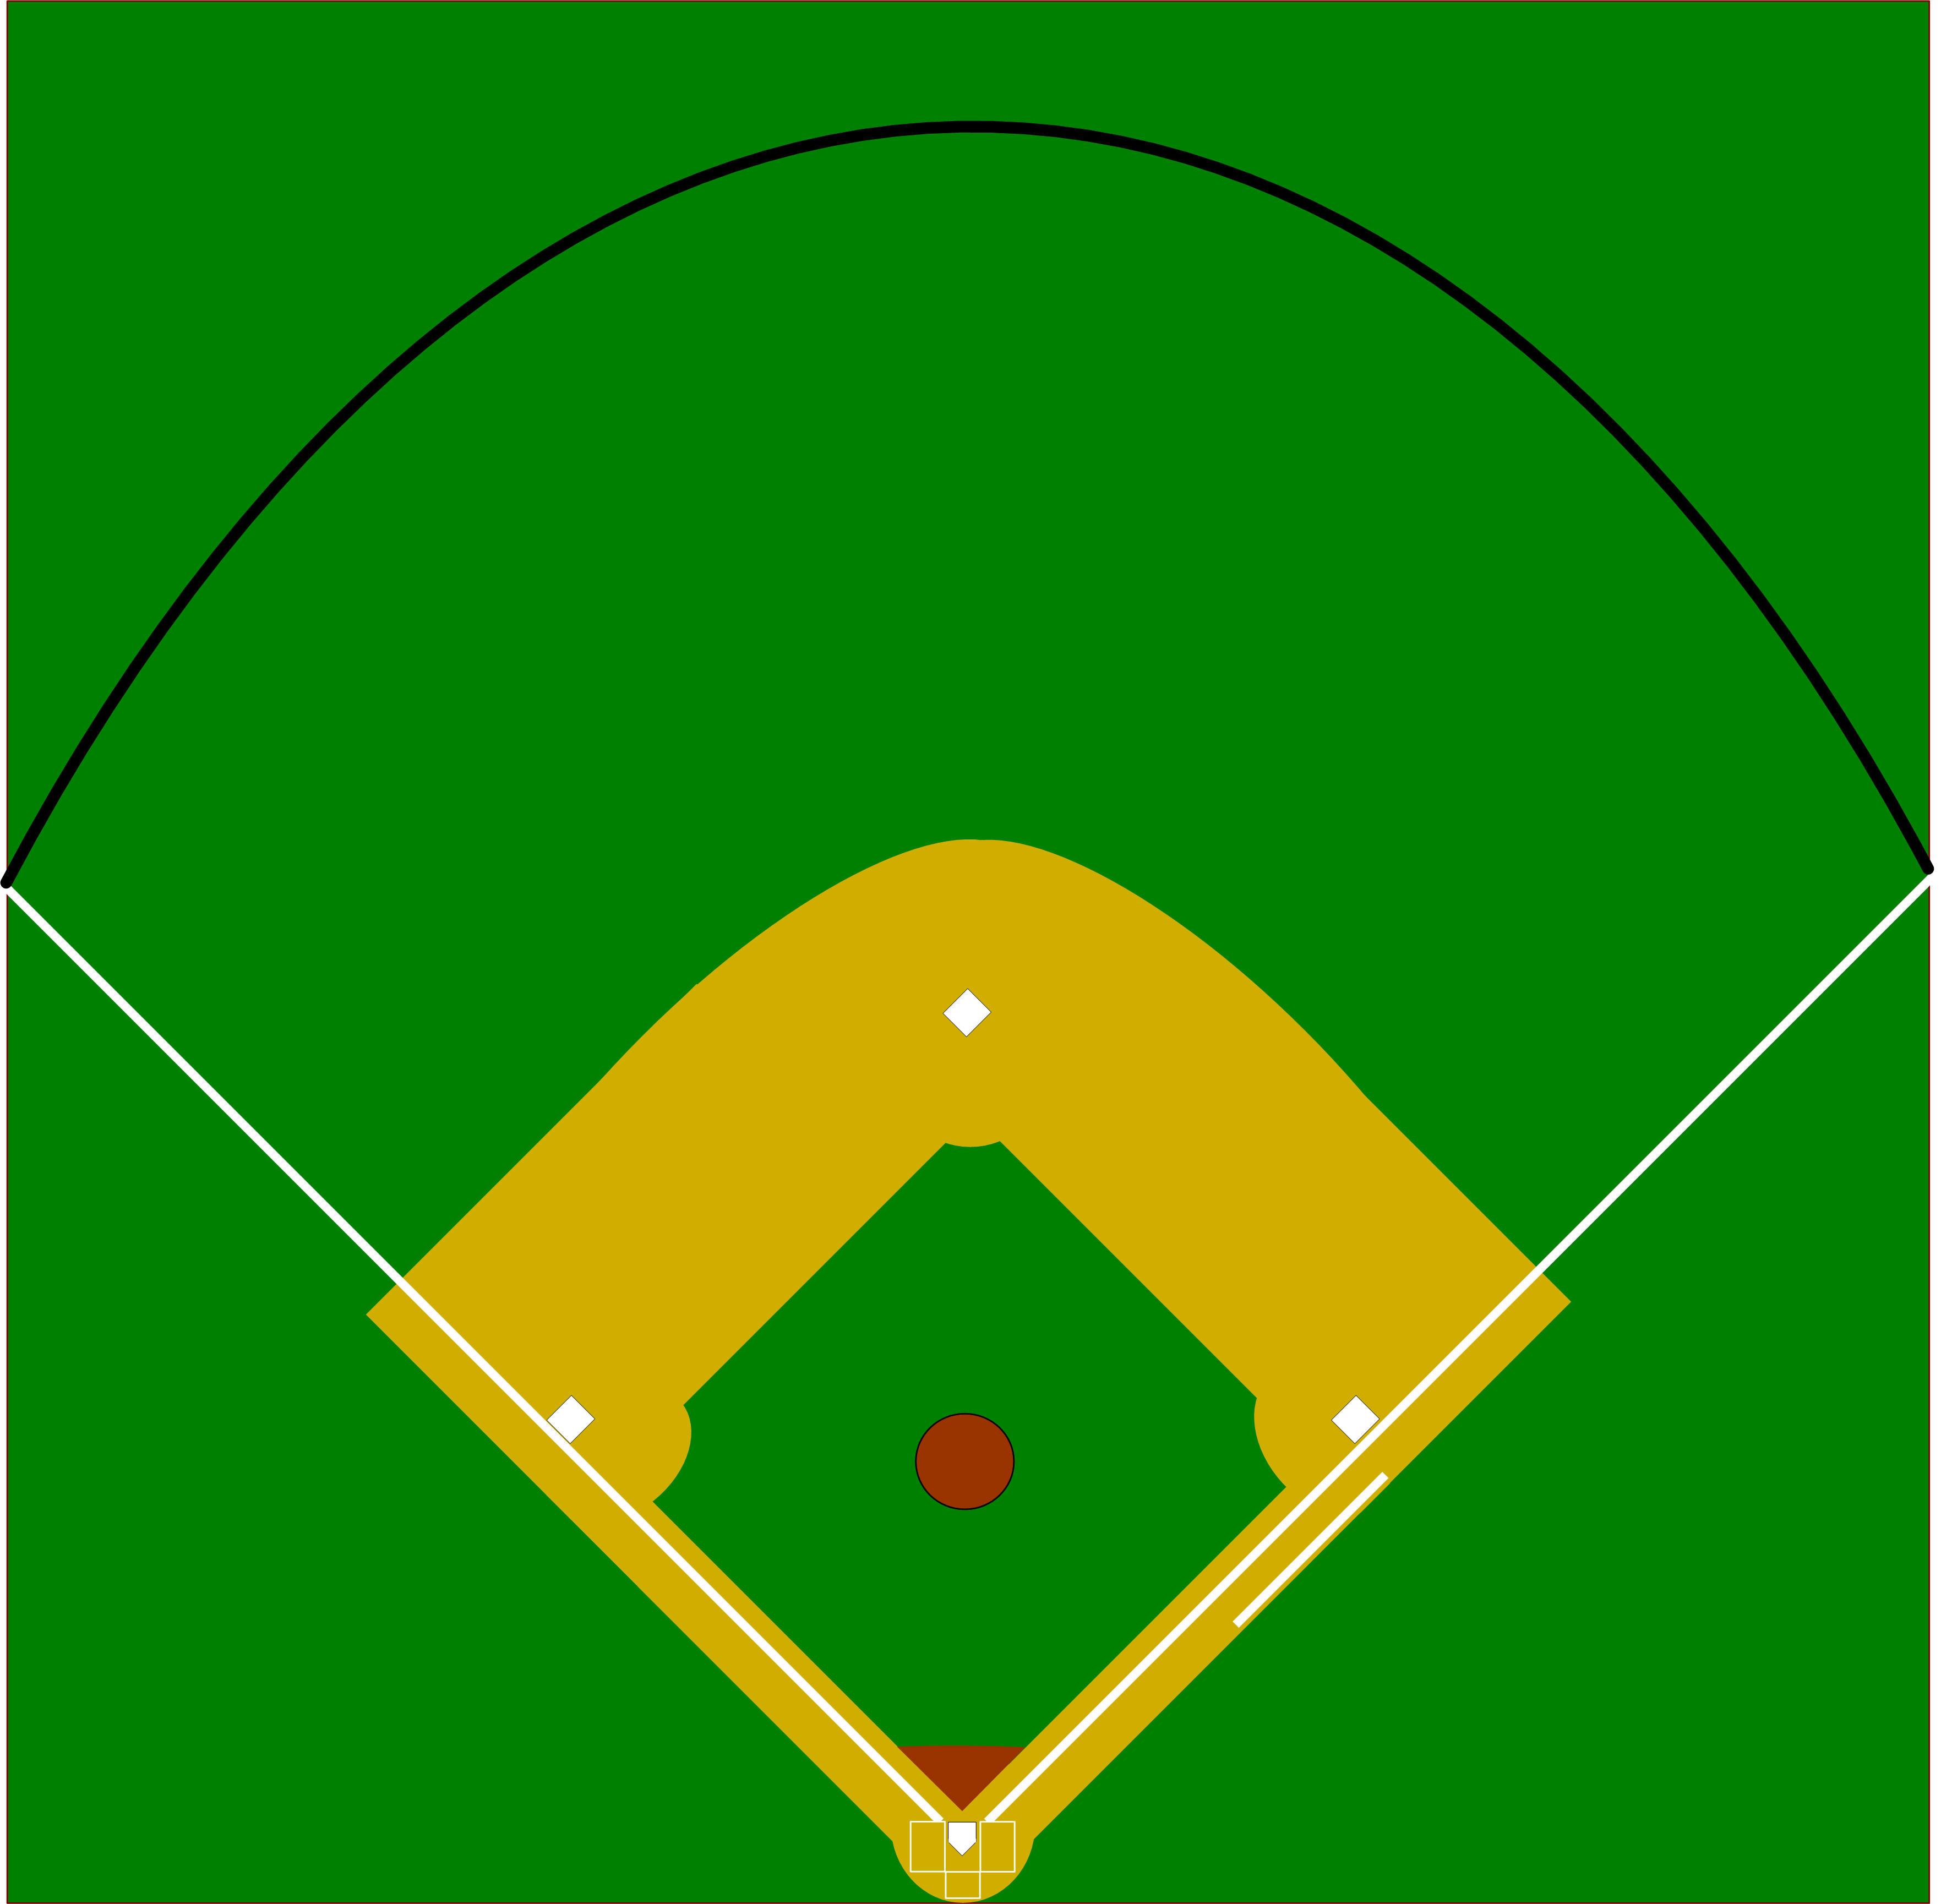 Baseball fence clipart clip transparent Baseball Diamond Diagram Clipart | Free download best Baseball ... clip transparent